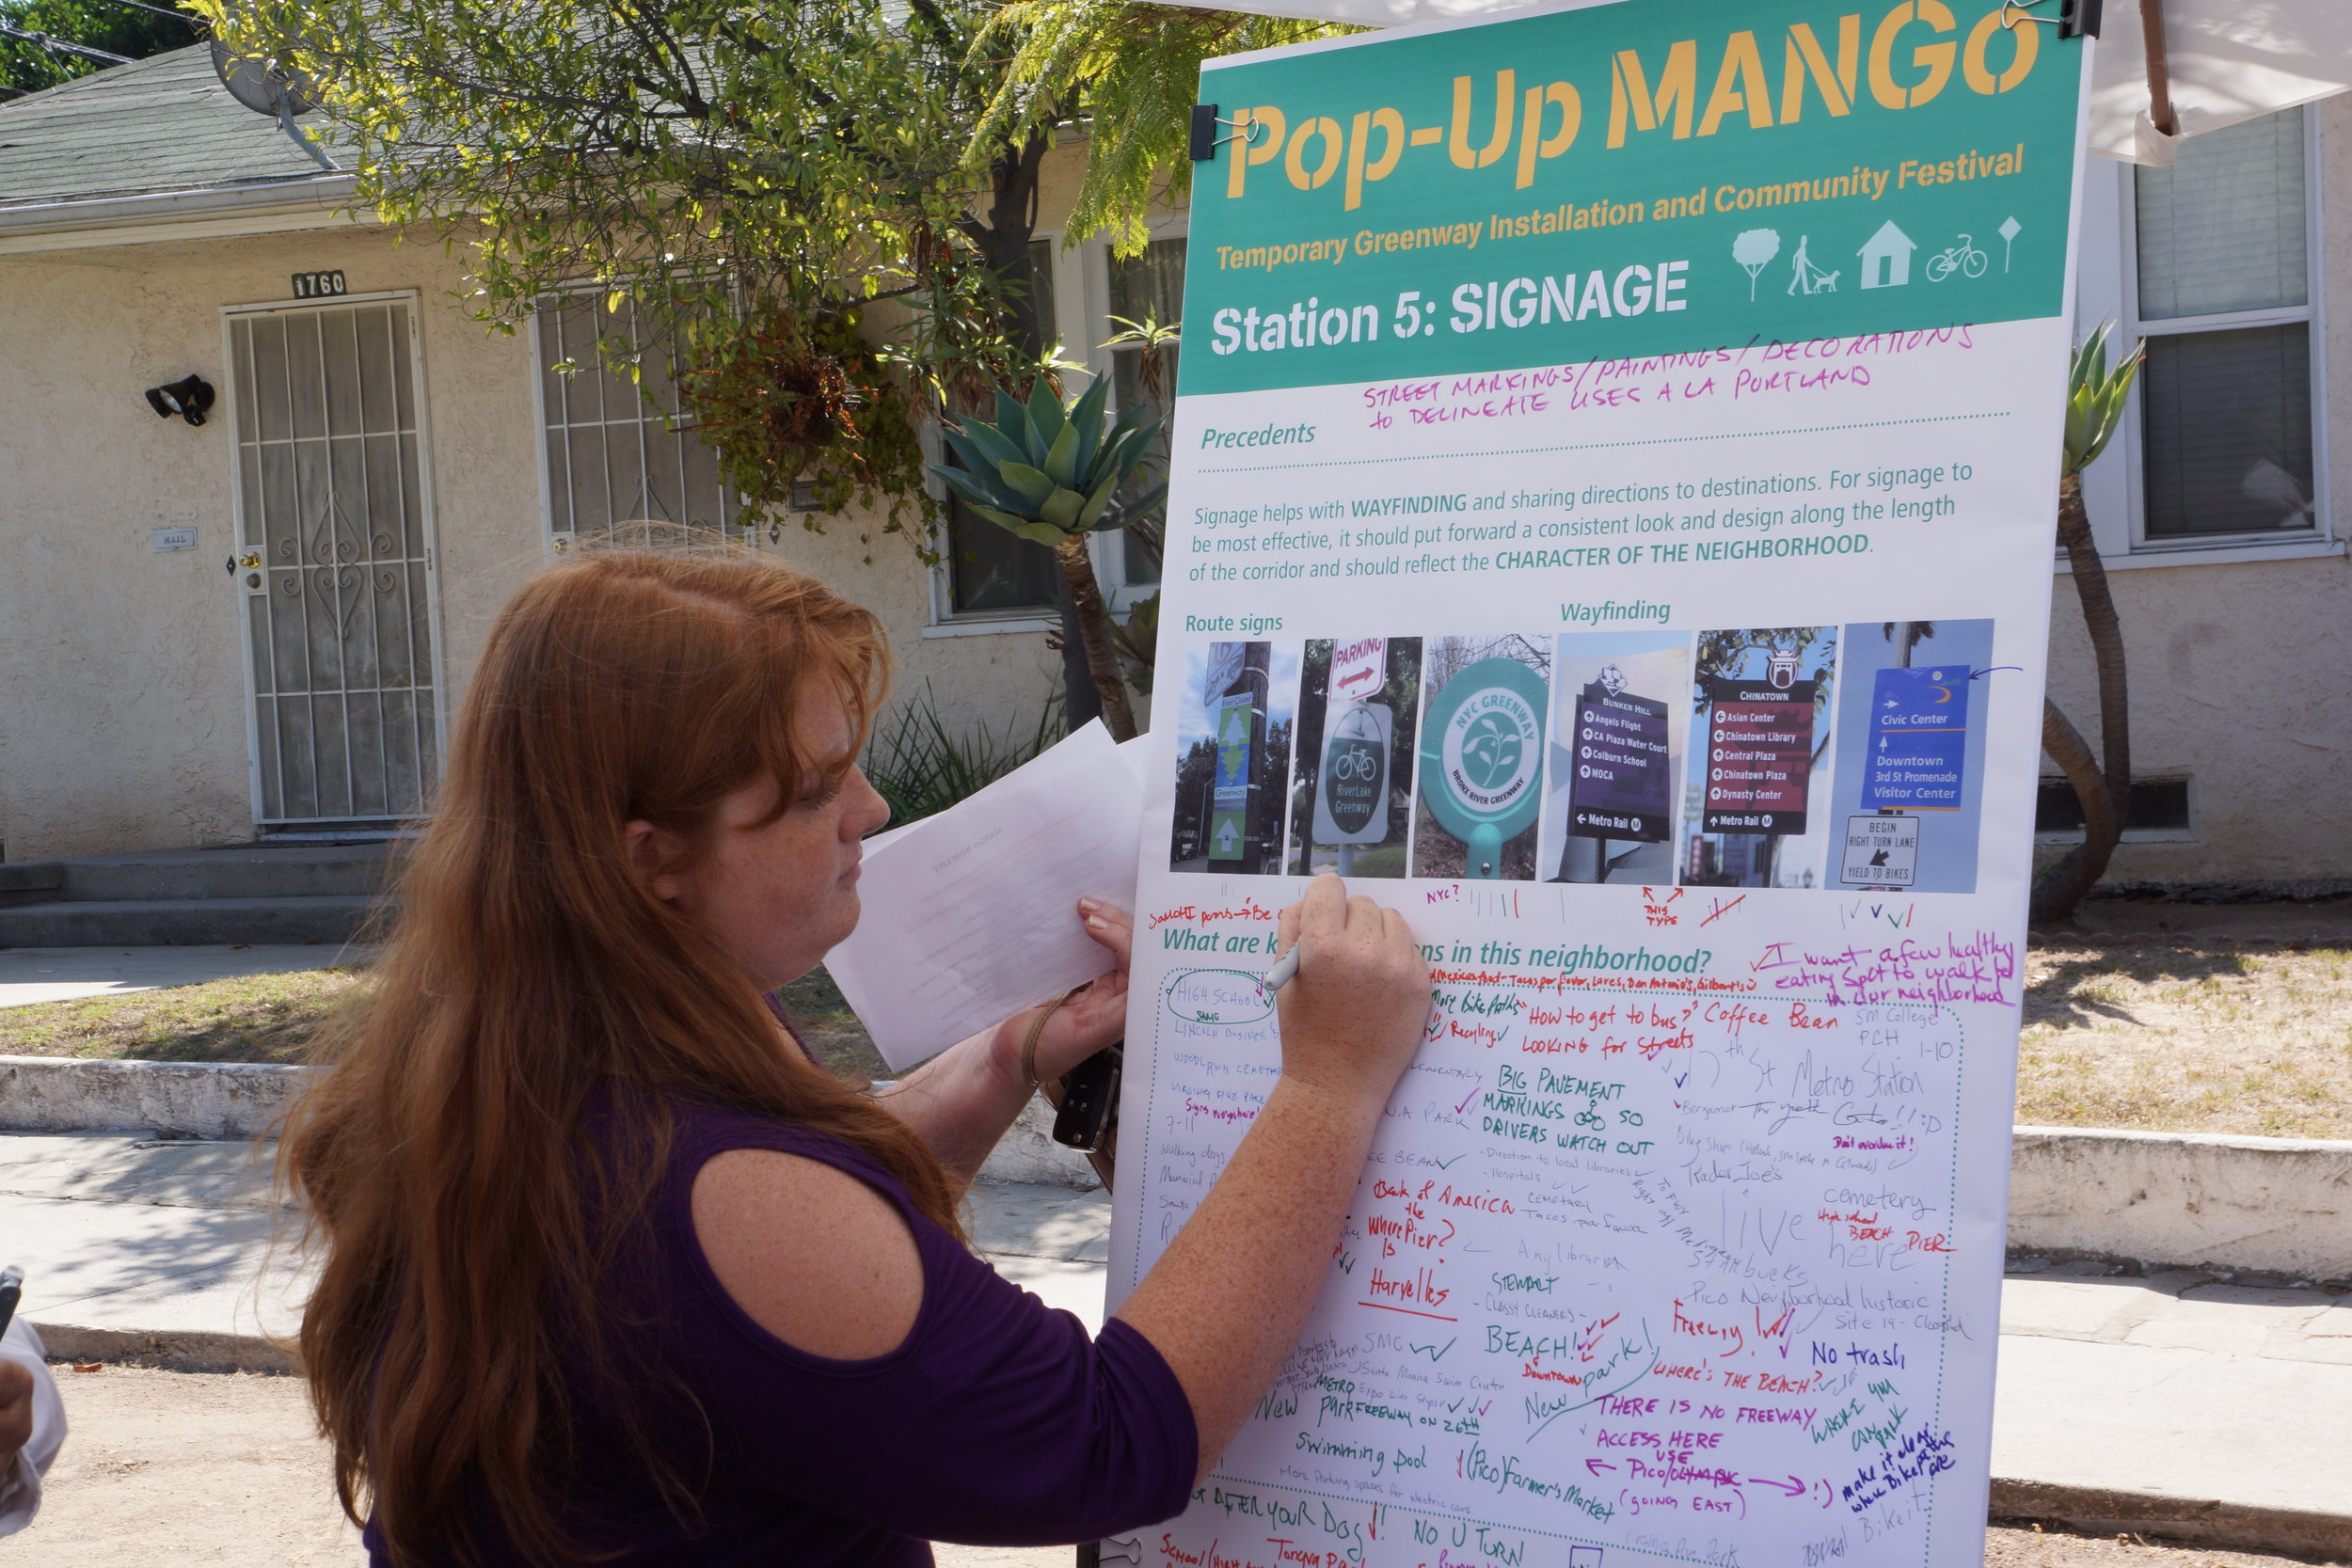 Pop_Up_MANGo (45).JPG